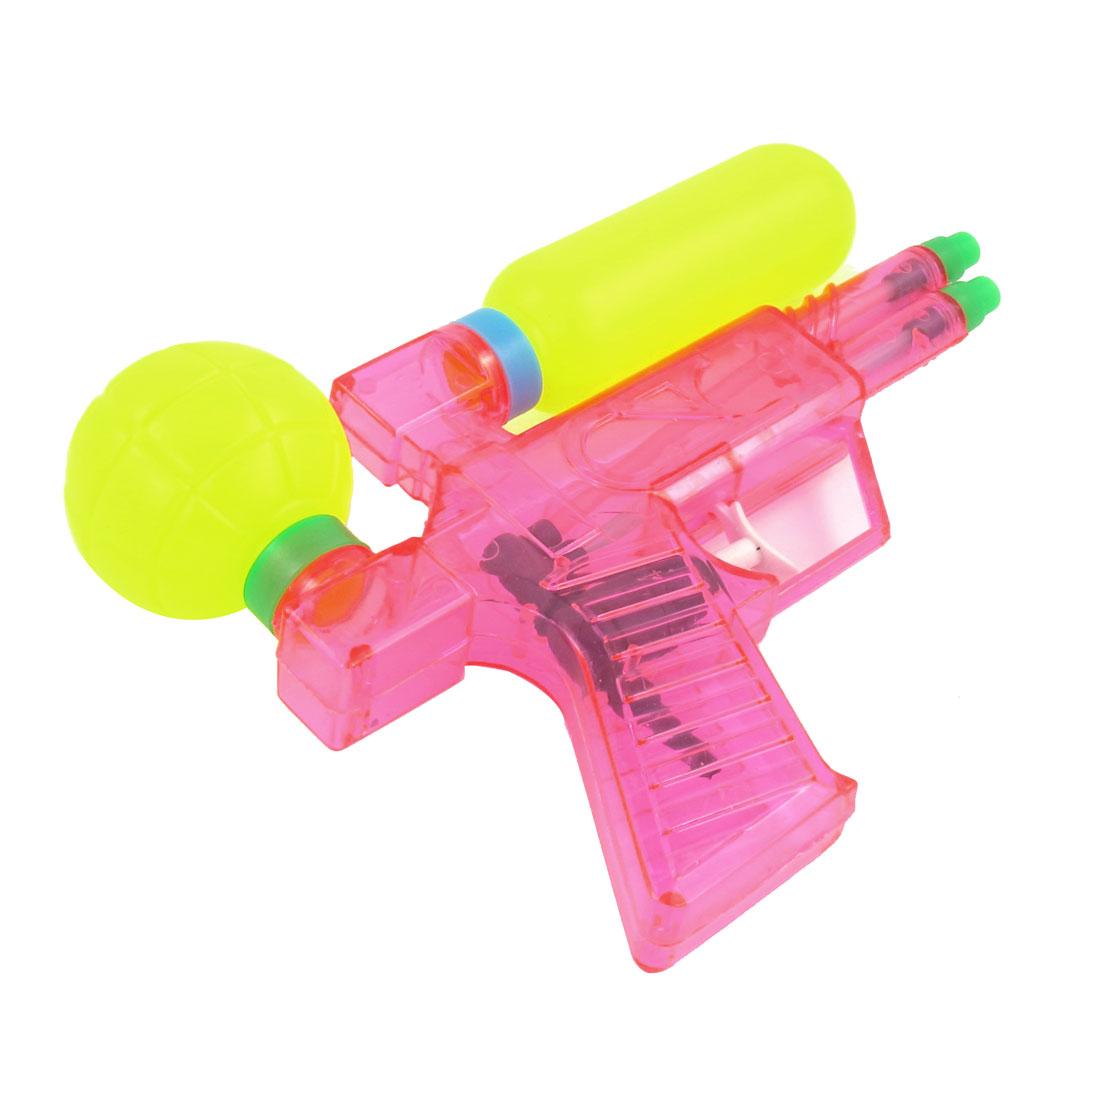 Yellow-Pink-Trigger-Rocket-Water-Spray-Squirt-Gun-Toy-for-Child